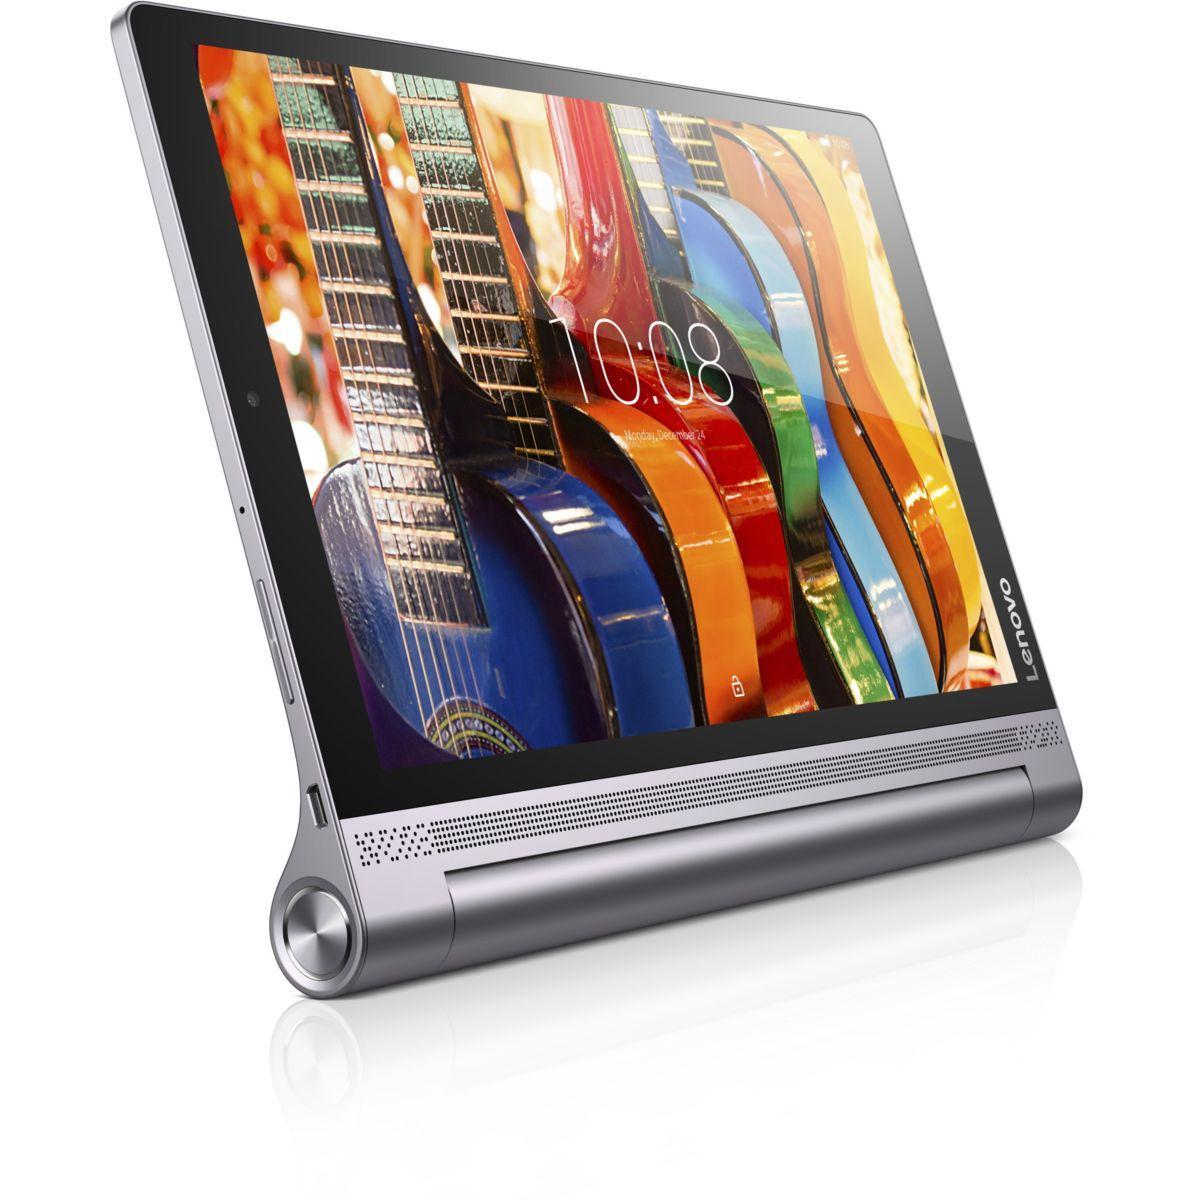 Tablette lenovo yoga tab 3 pro x90f - 5% de remise immédiate avec le code : wd5 (photo)